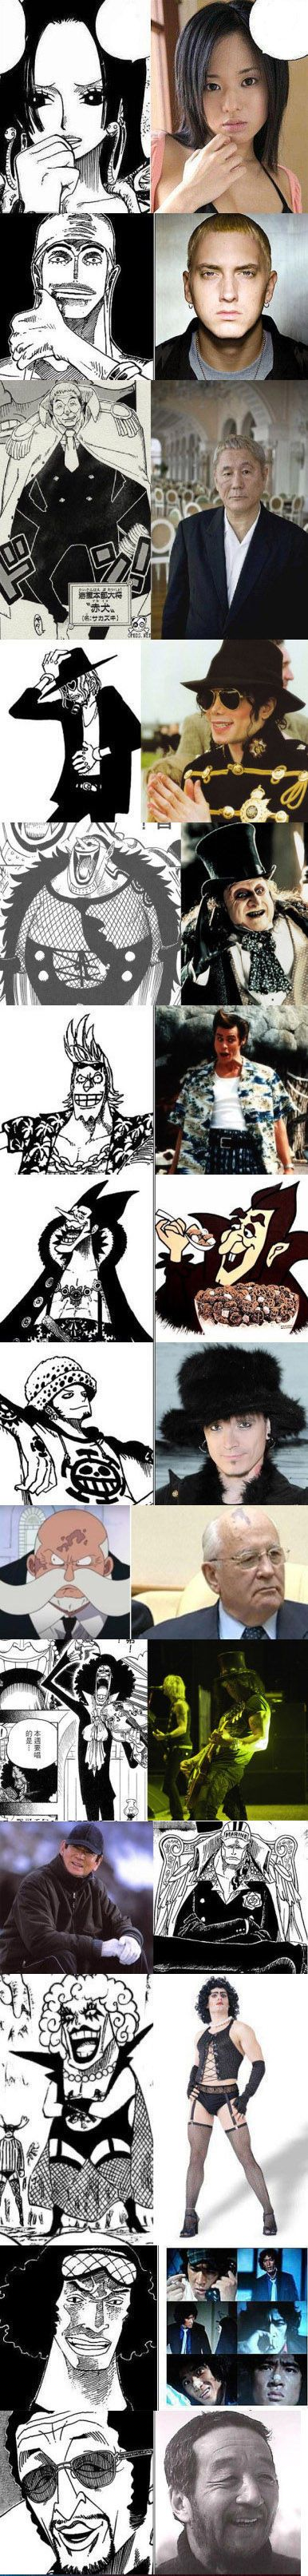 Caricaturas diversas